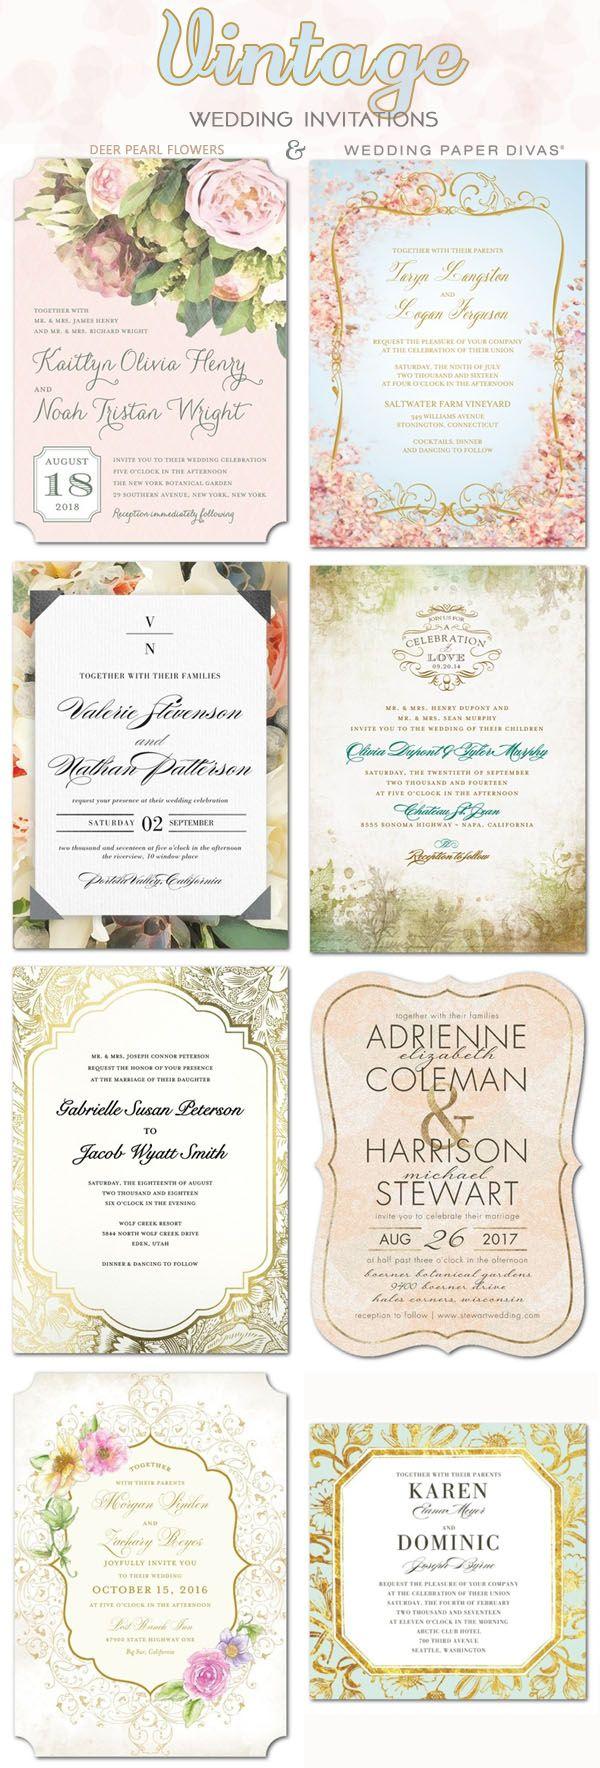 top 8 themed shutterfly wedding invitations wedding With shutterfly beach wedding invitations